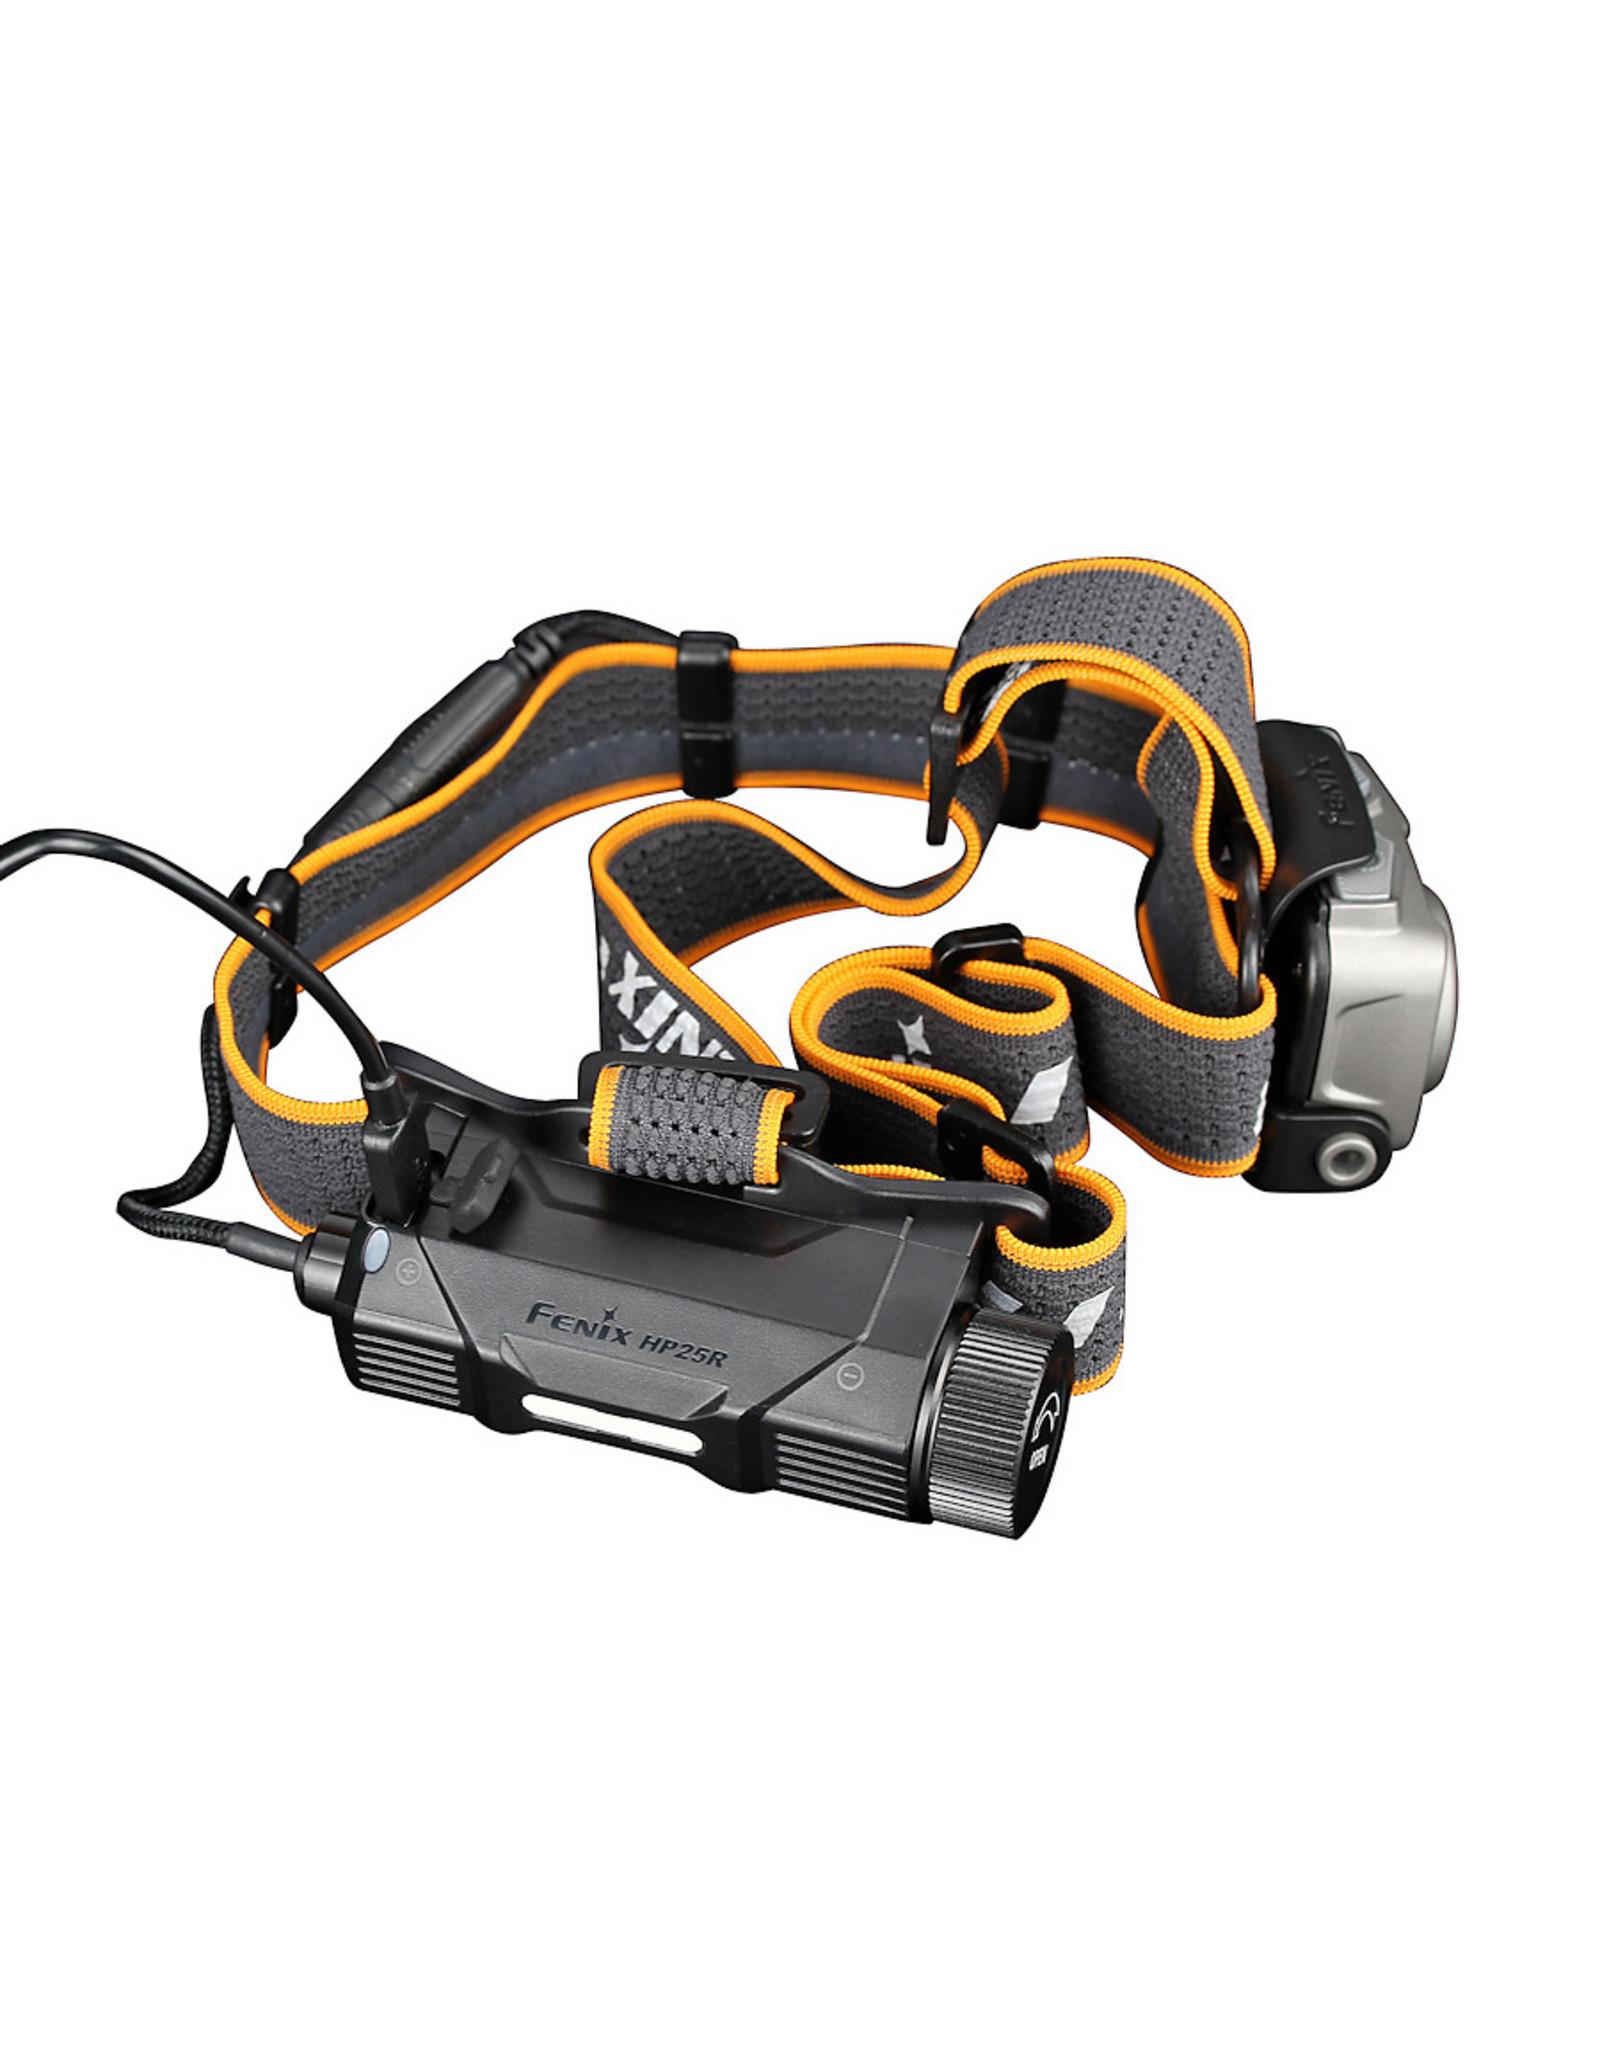 Fenix Fenix HP25R V2.0